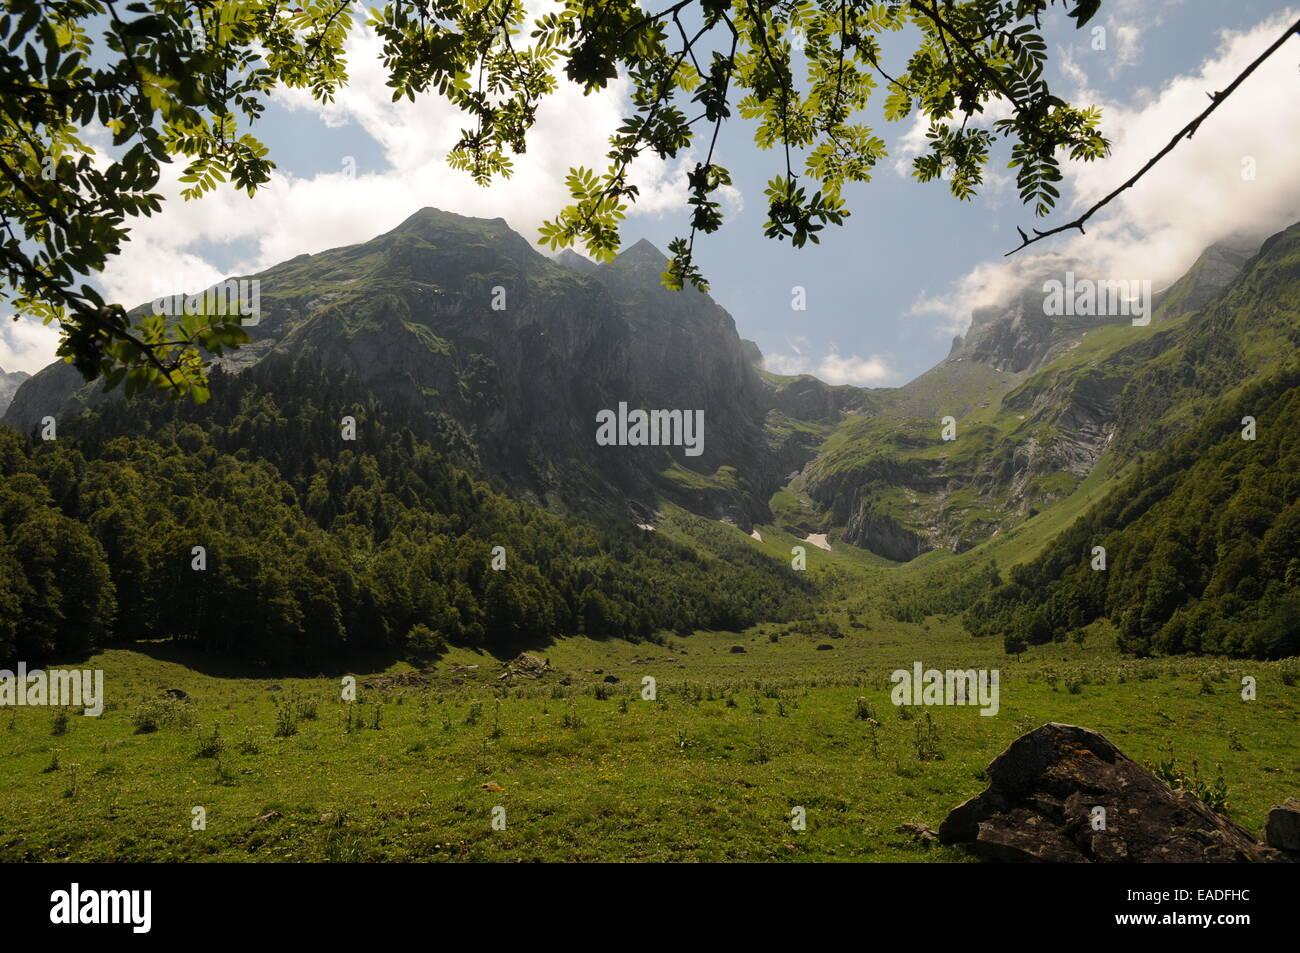 Artiga de Lin. Paisaje Montañoso del Valle de Aran En el Pirineo Catalán, España. Stockbild